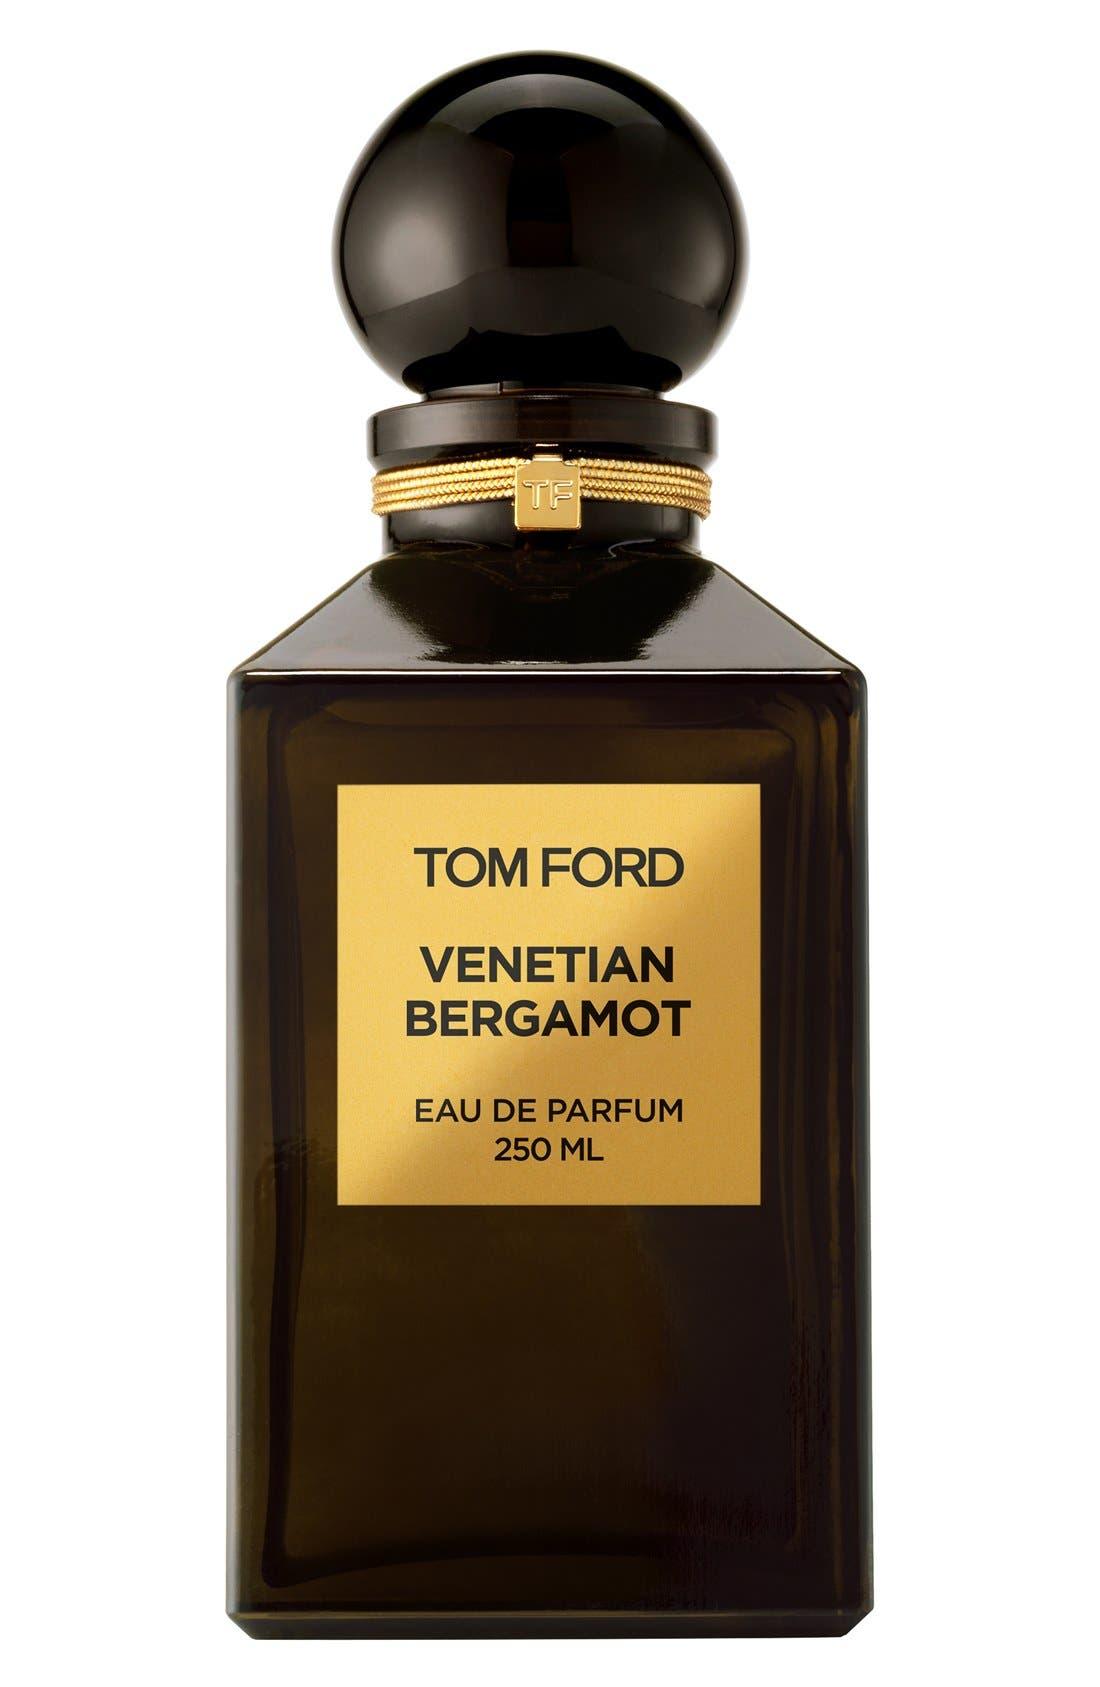 Tom Ford Private Blend Venetian Bergamot Eau de Parfum Decanter